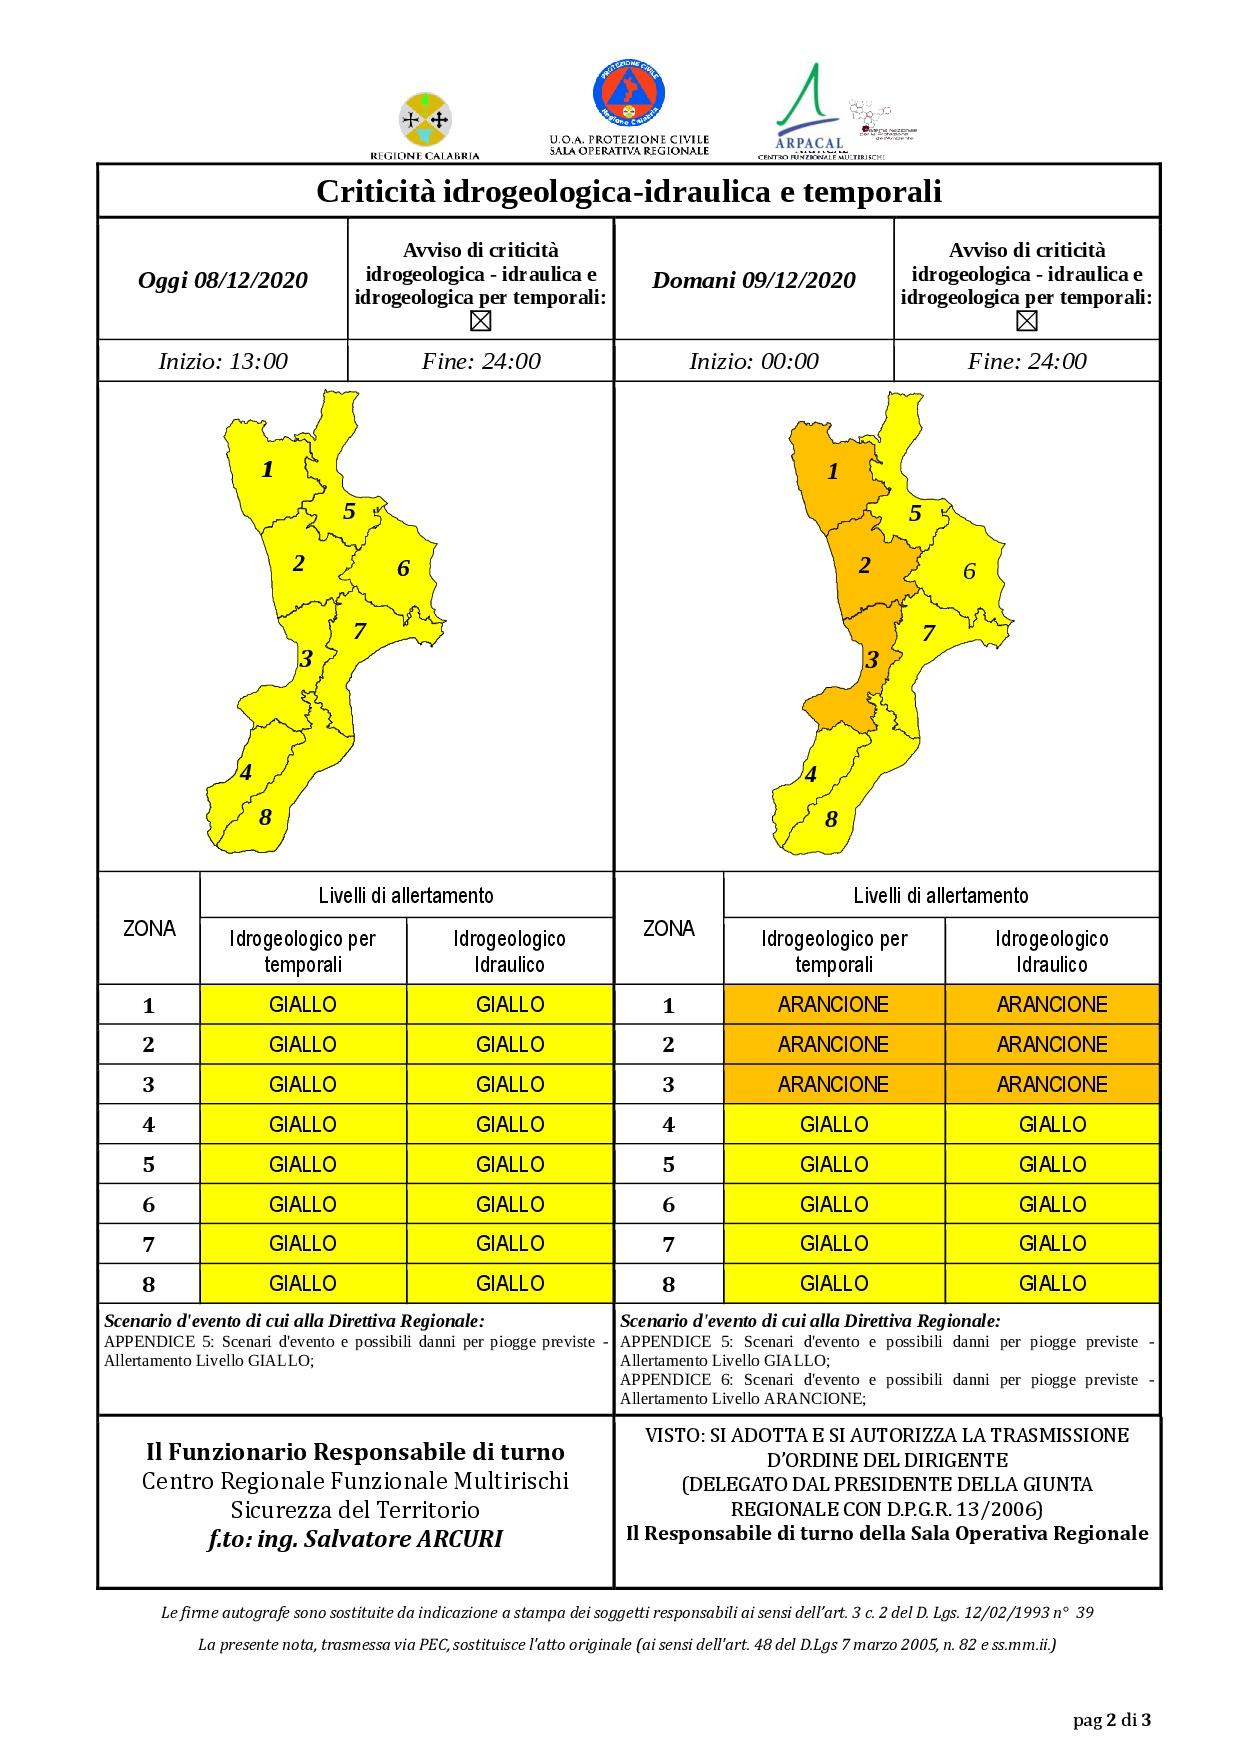 Criticità idrogeologica-idraulica e temporali in Calabria 08-12-2020